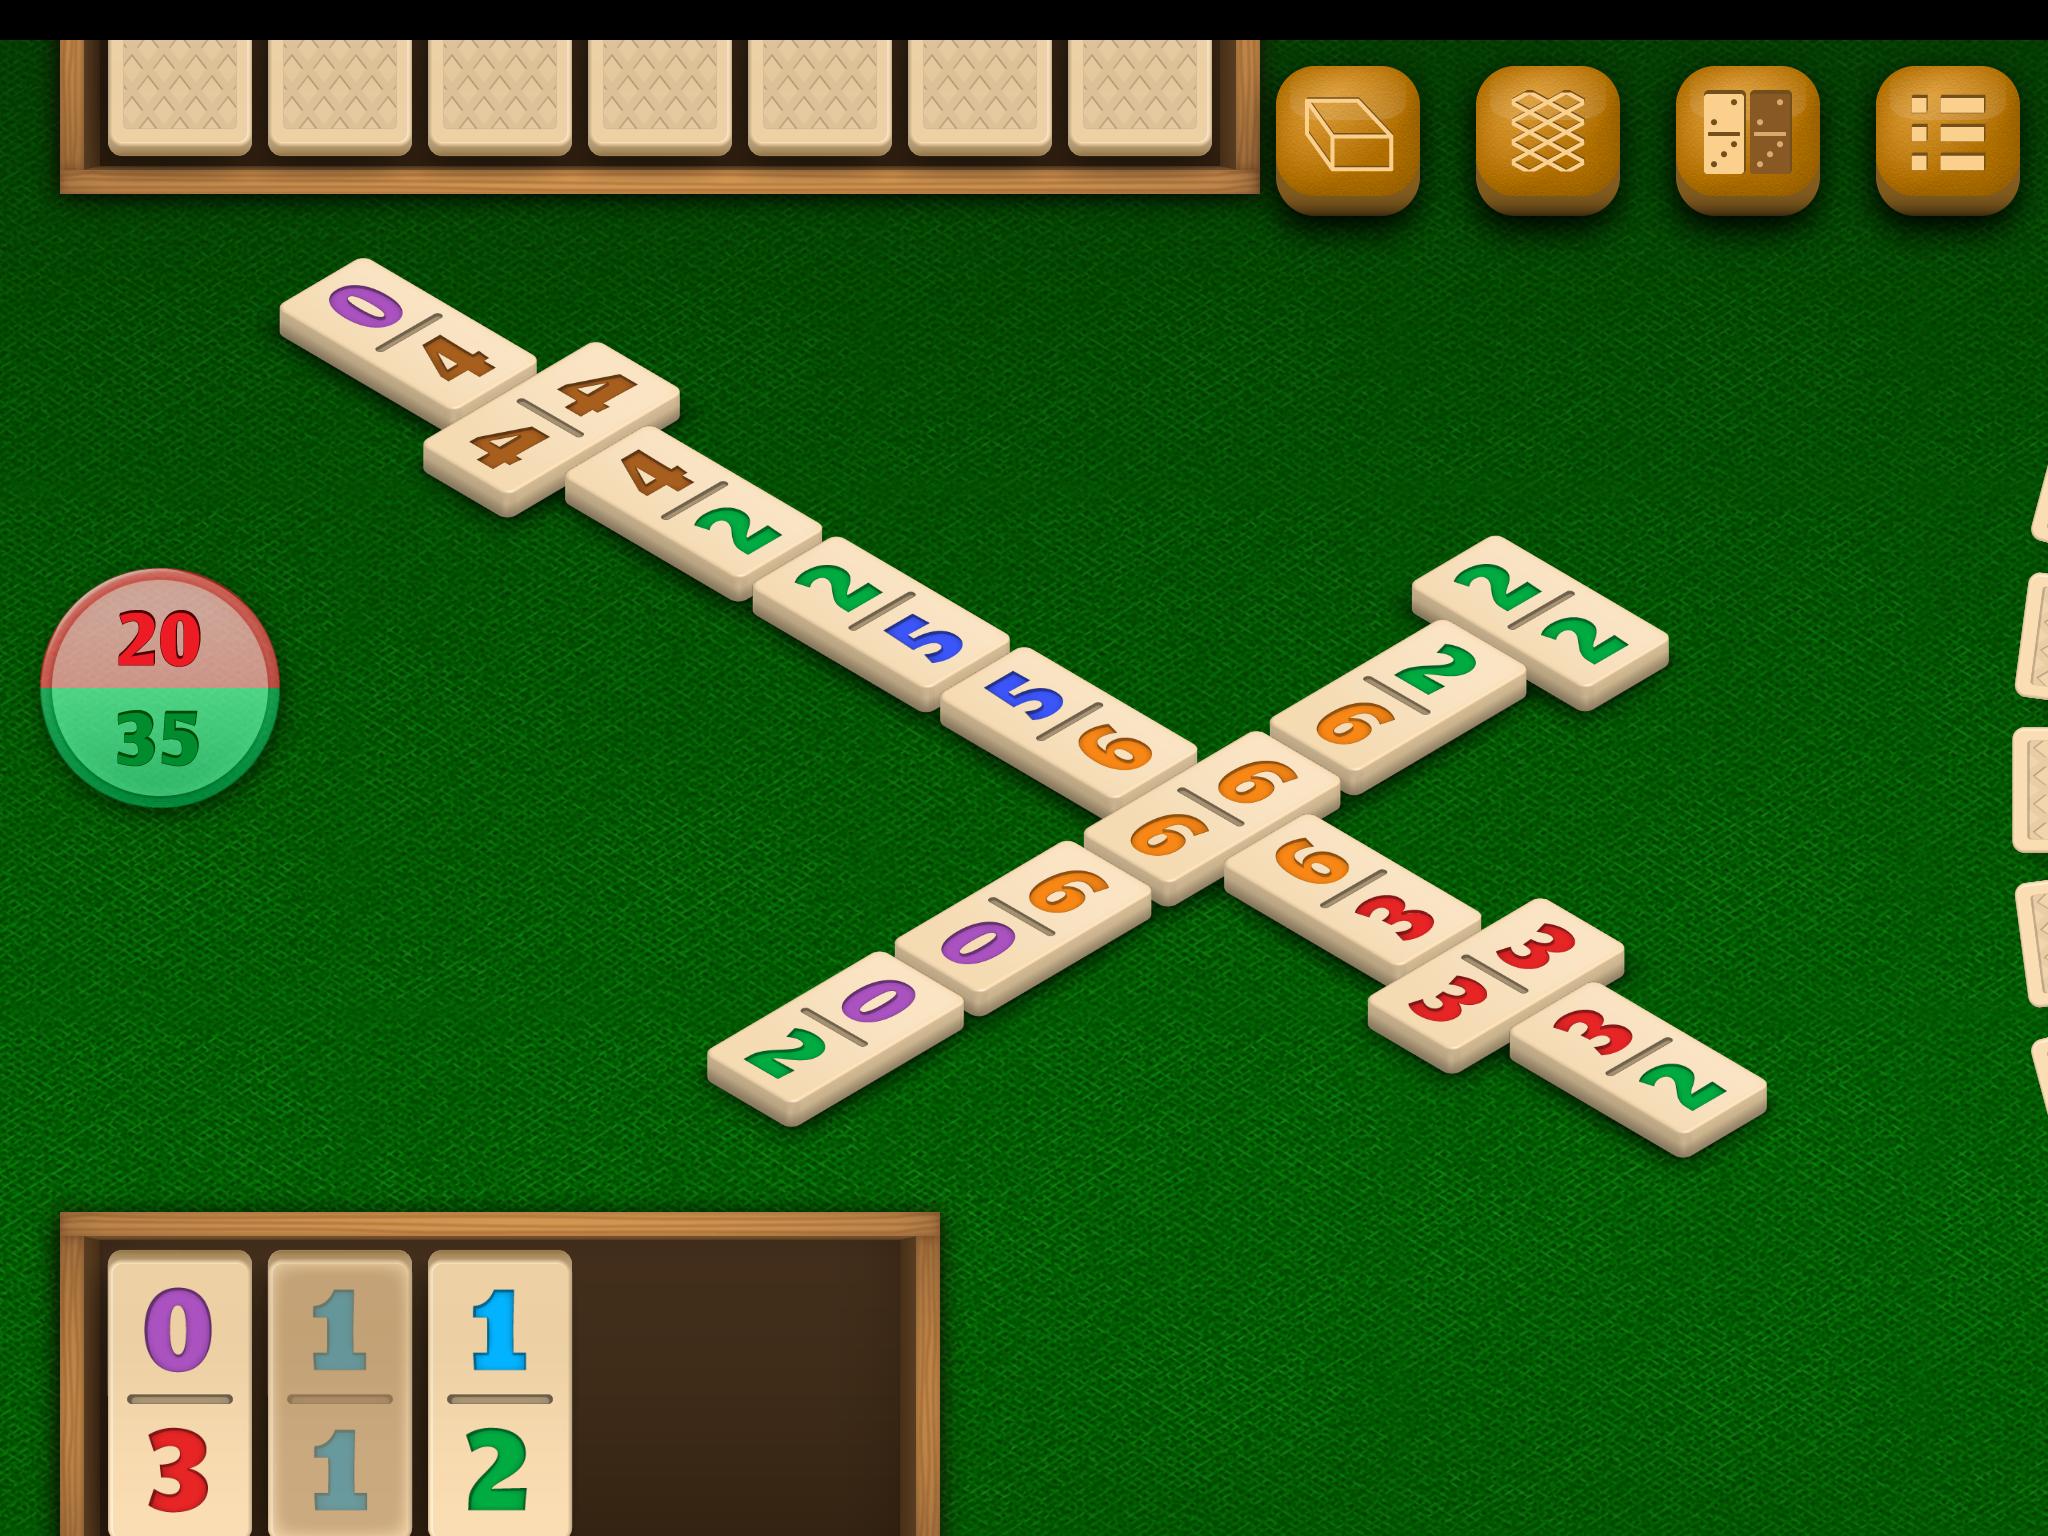 Dominos by DoraLogic, dementia-friendly app (alternative display 3)